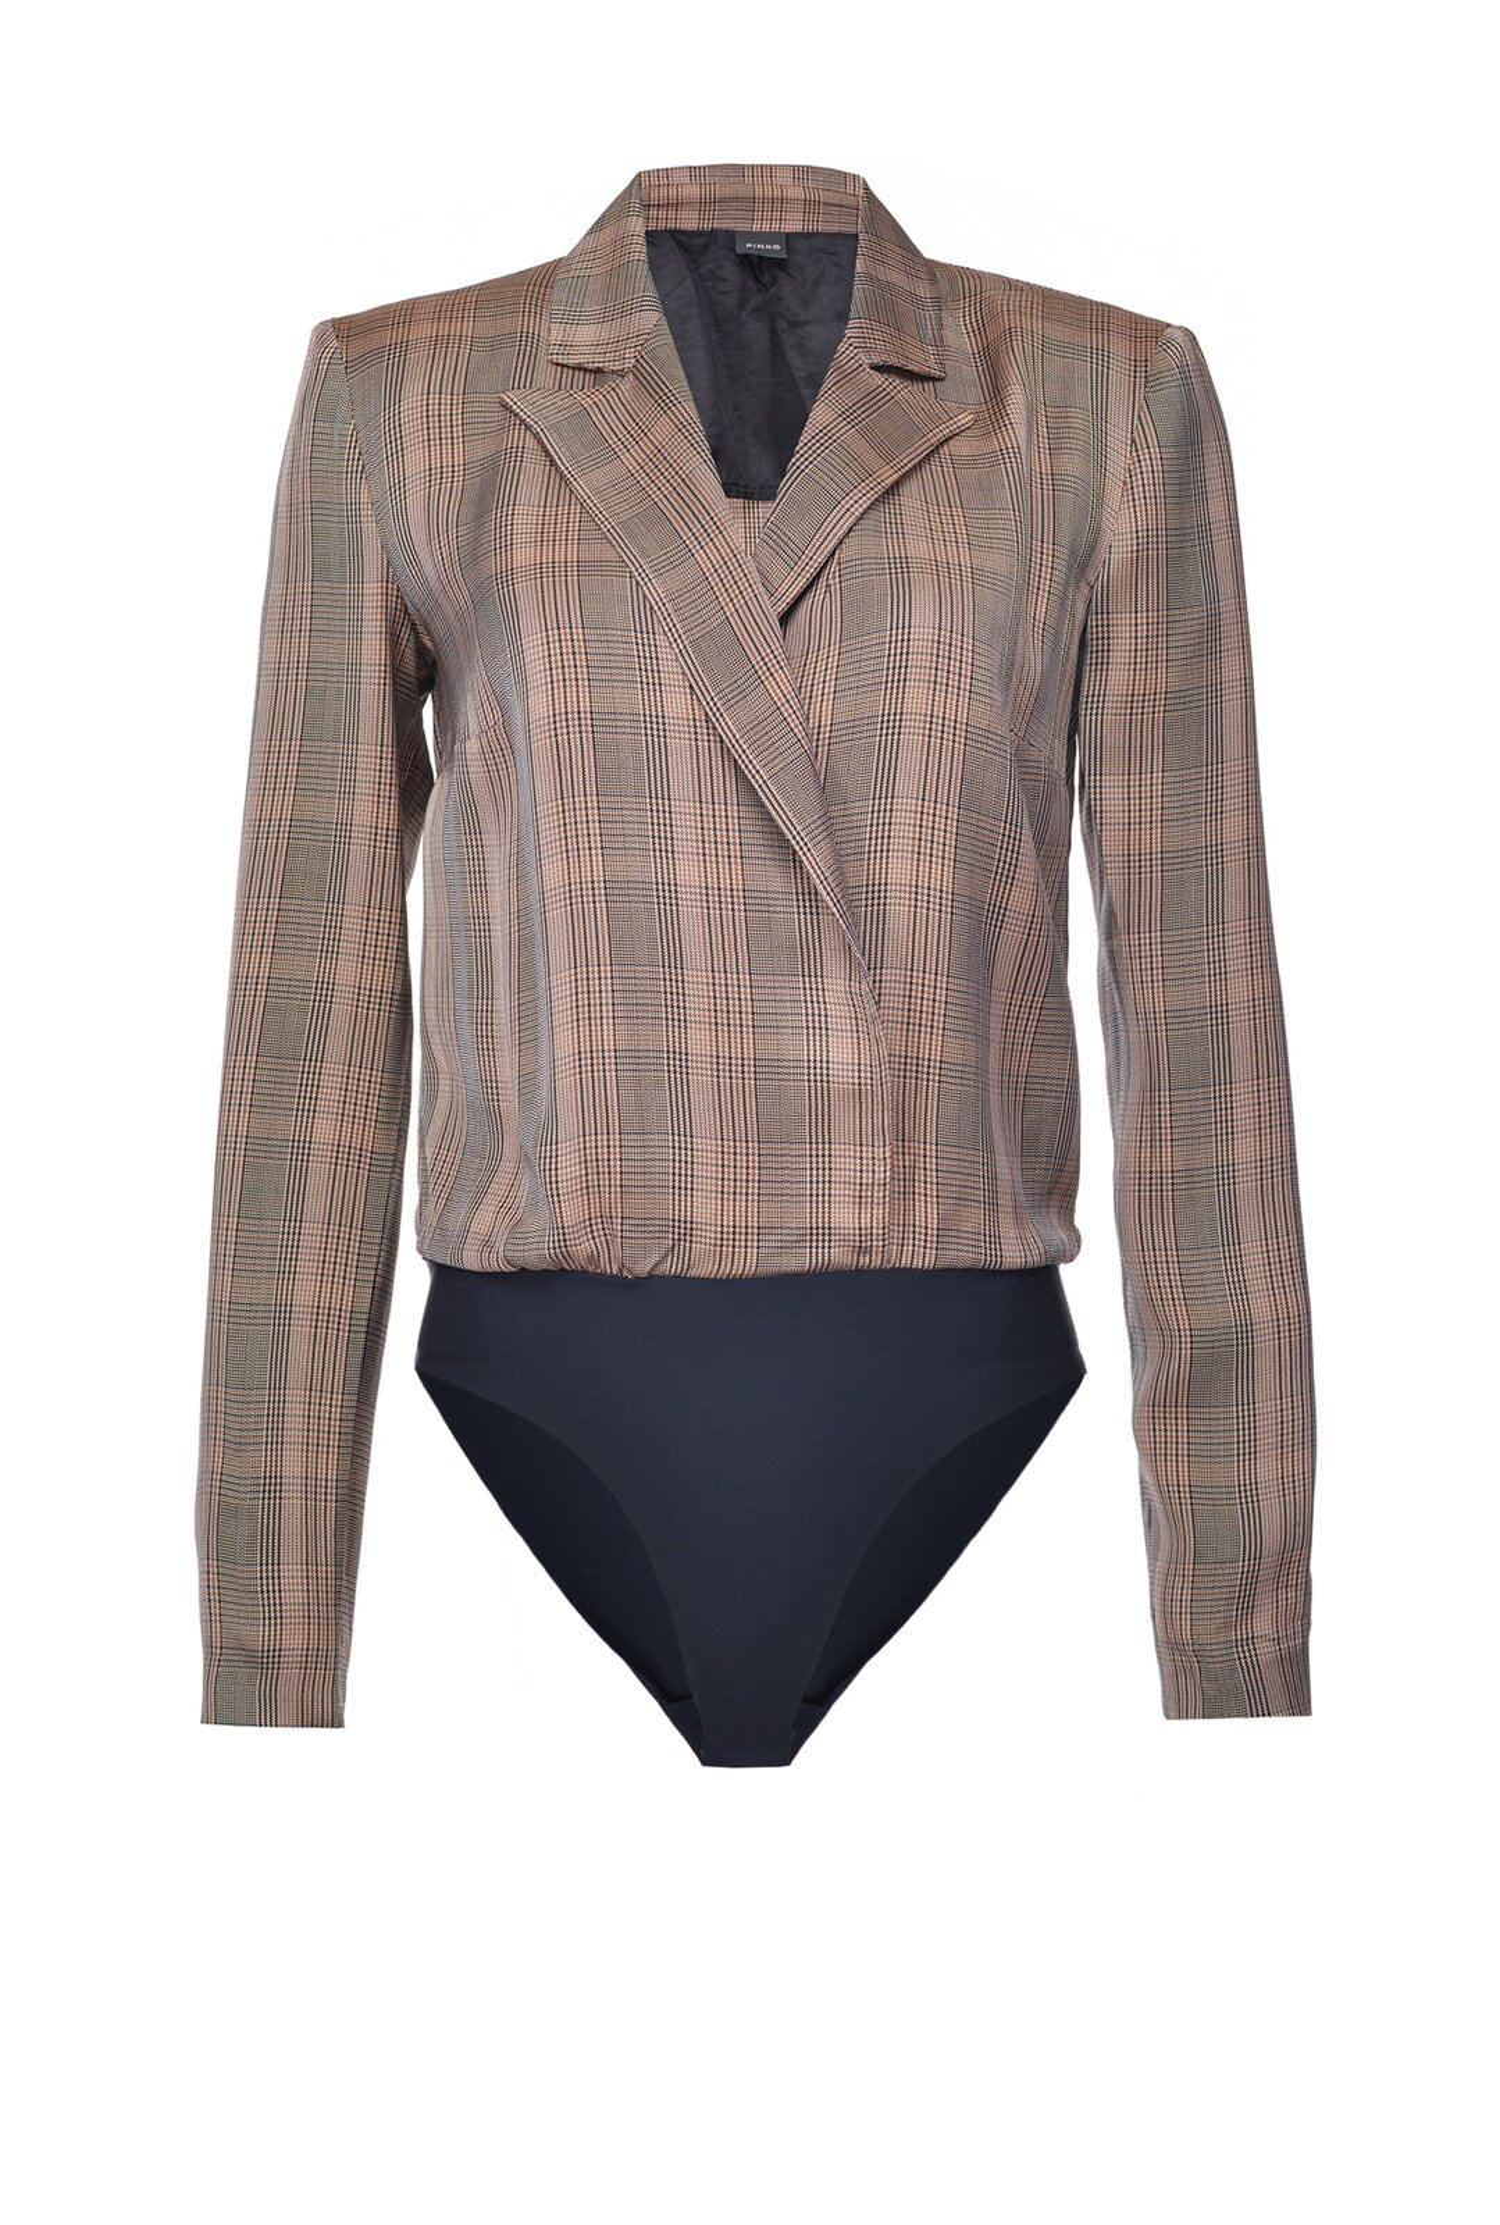 Check Design Body Jacket - Pinko